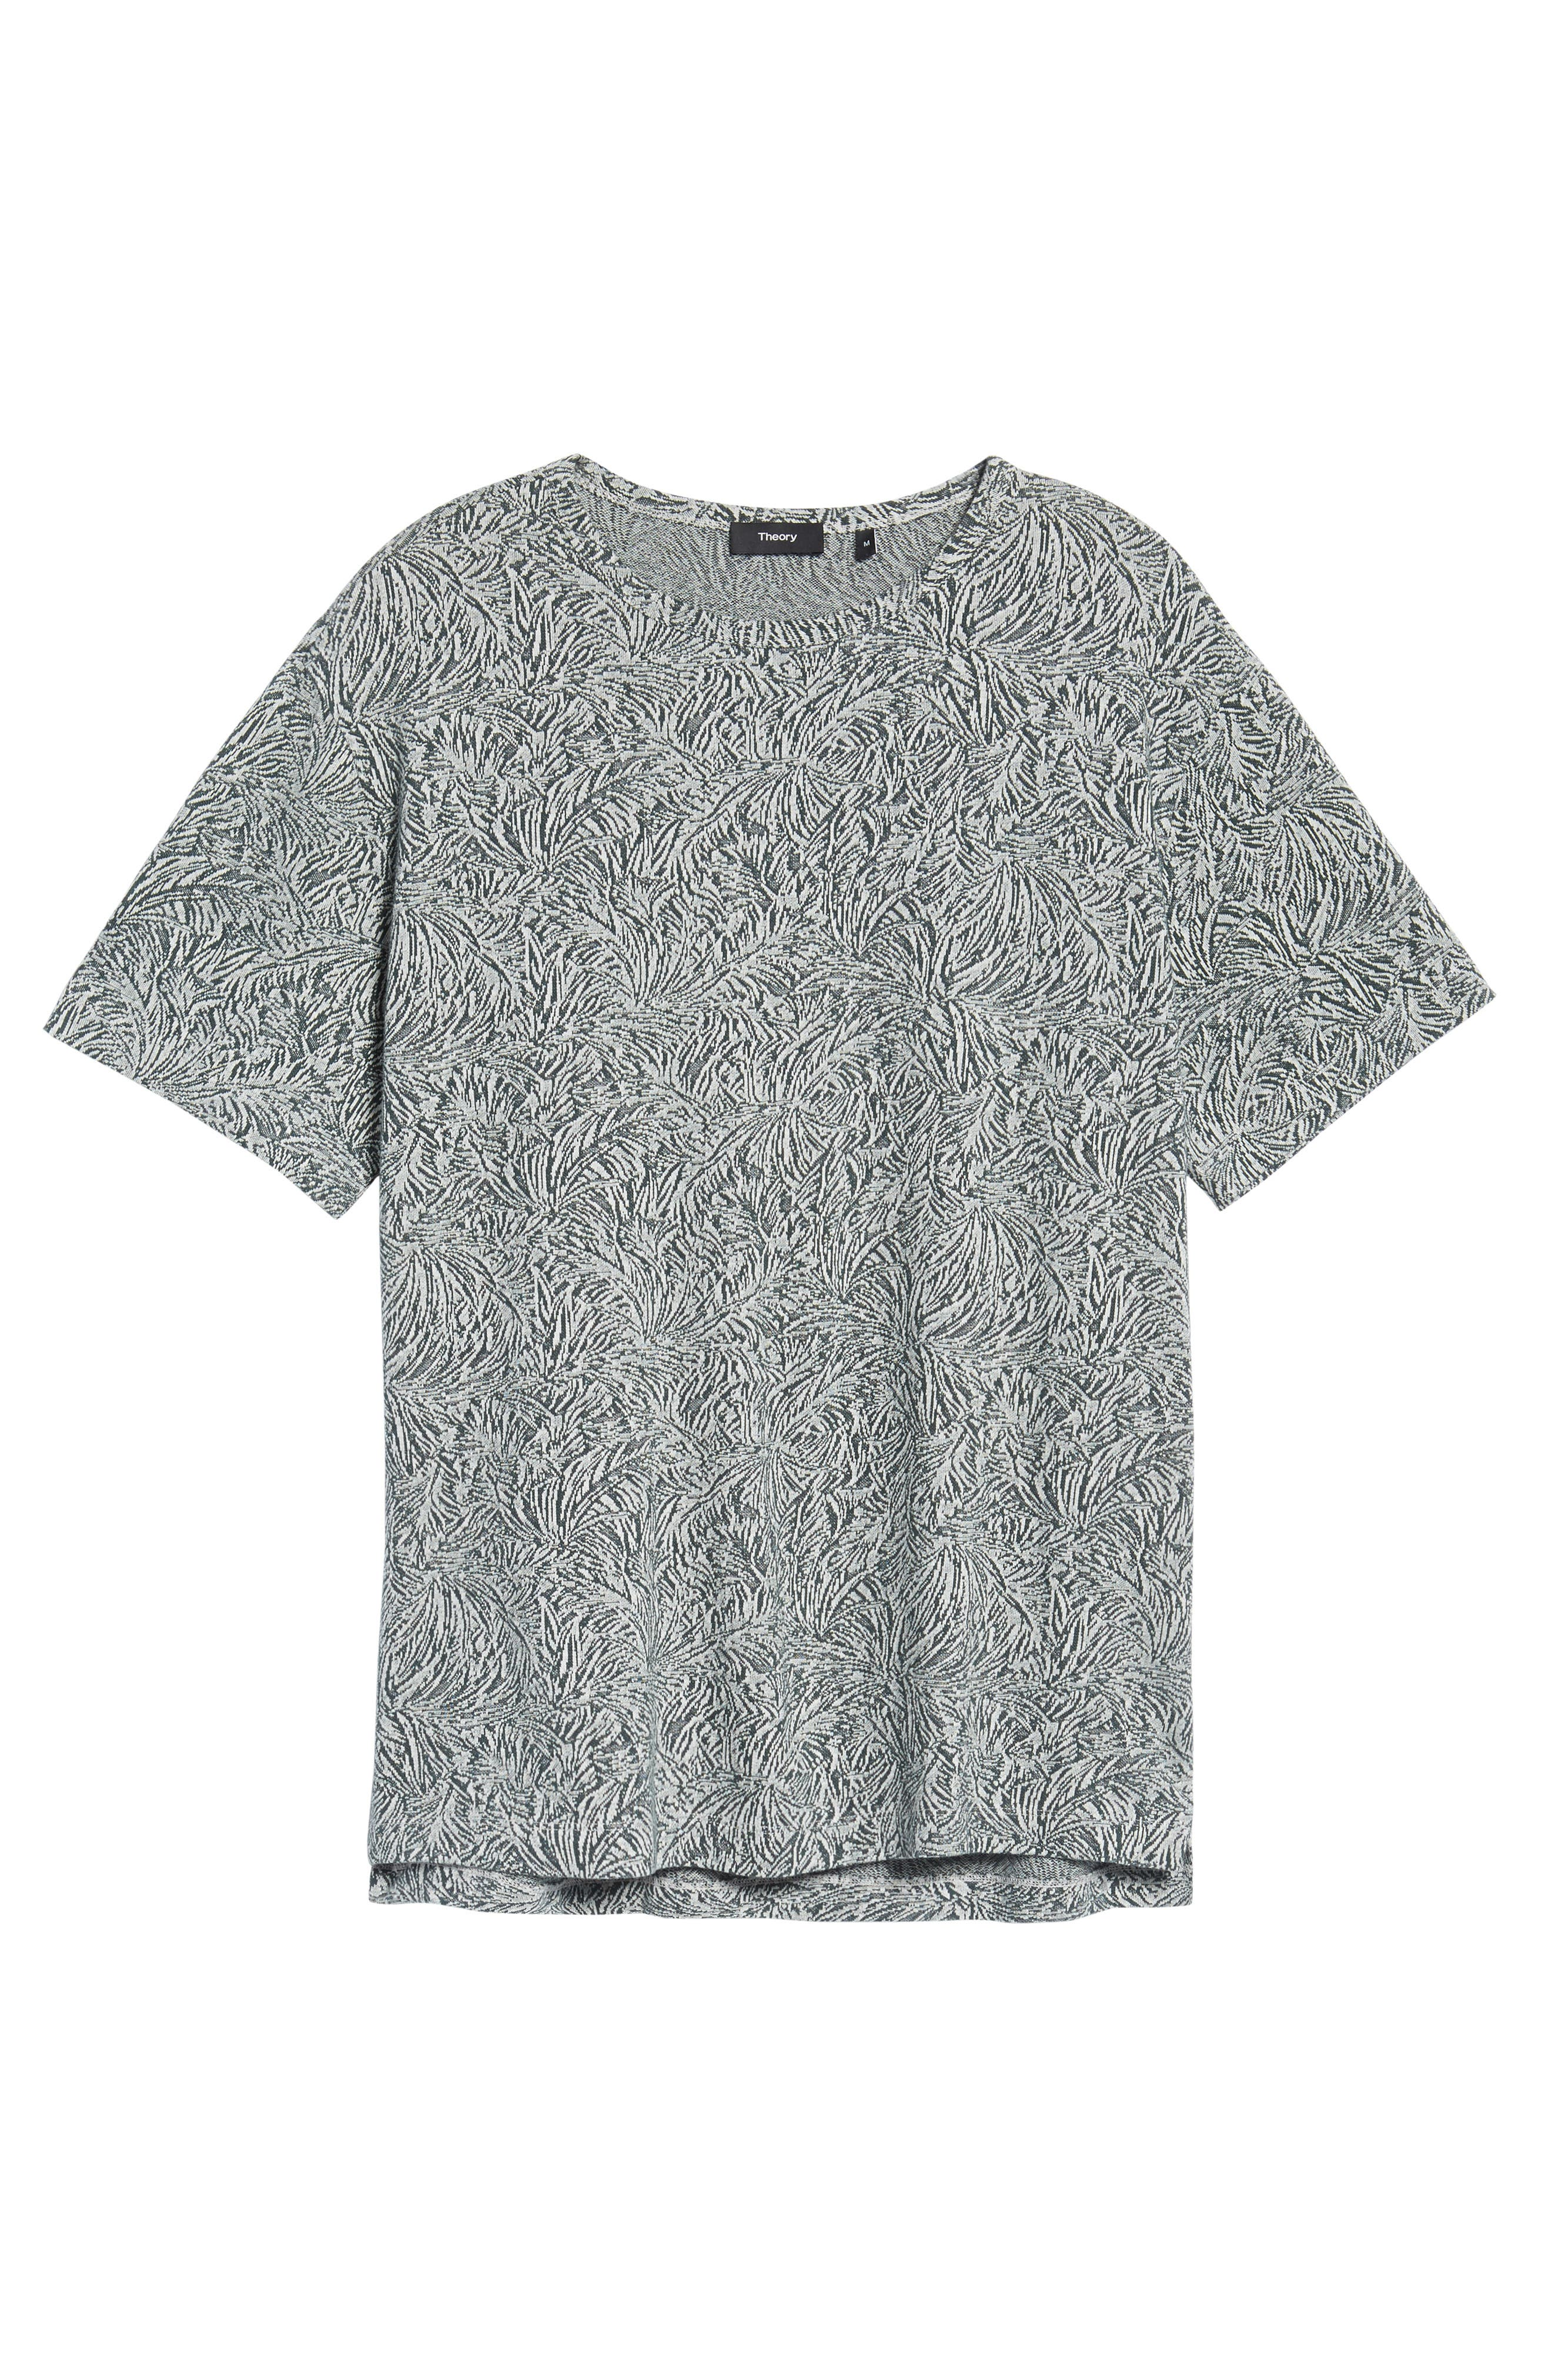 Palm Jacquard Crewneck T-Shirt,                             Alternate thumbnail 6, color,                             177